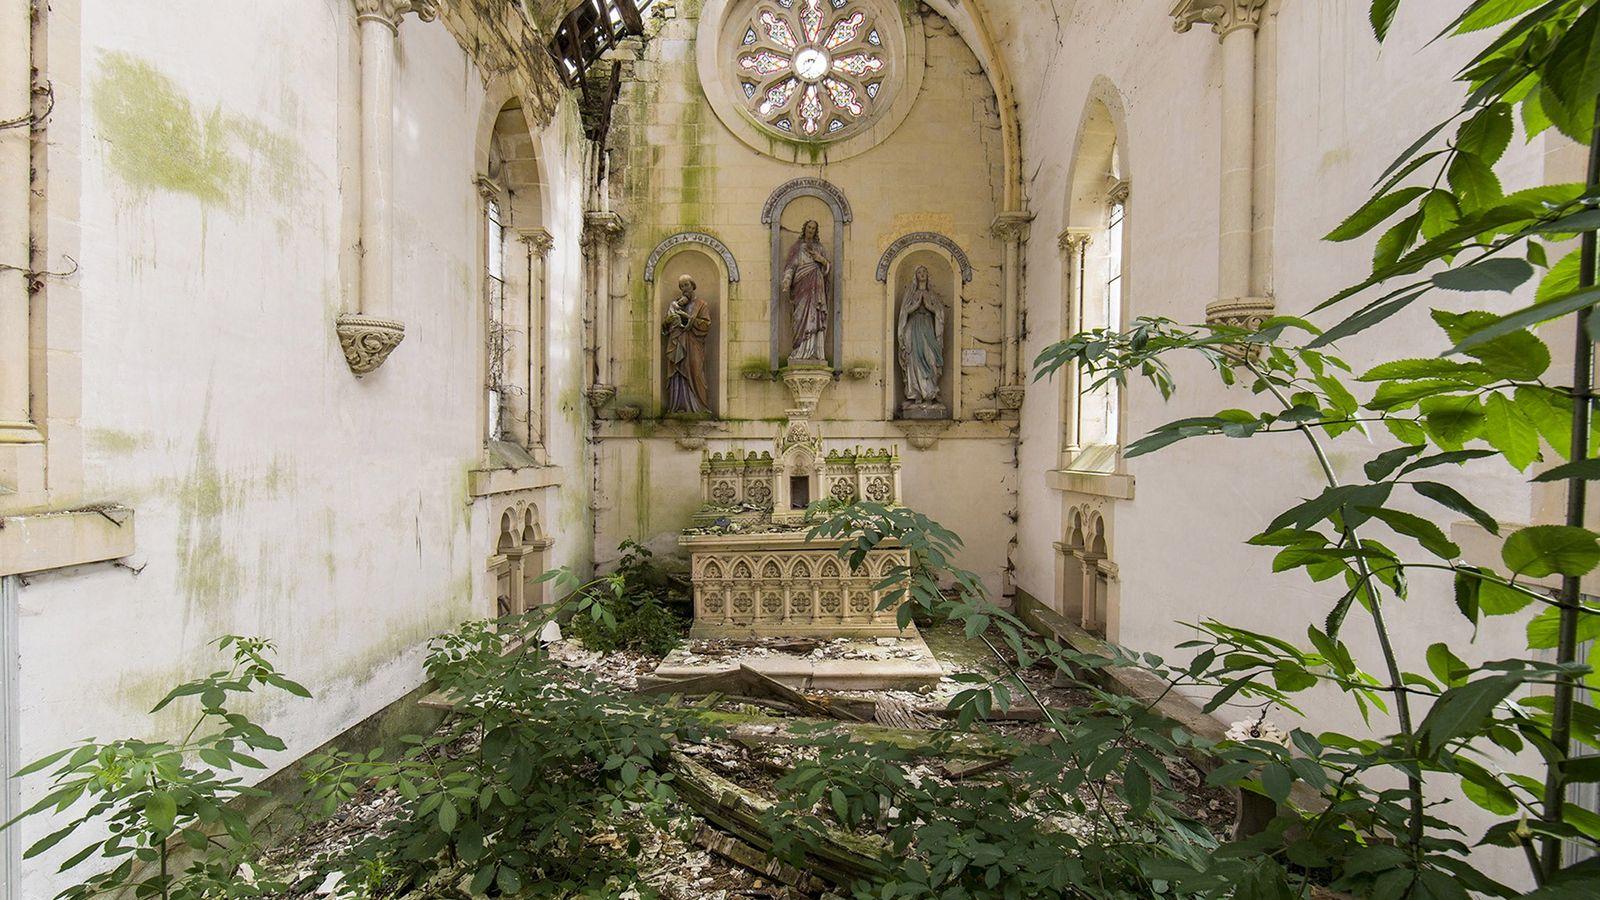 Chapel, France